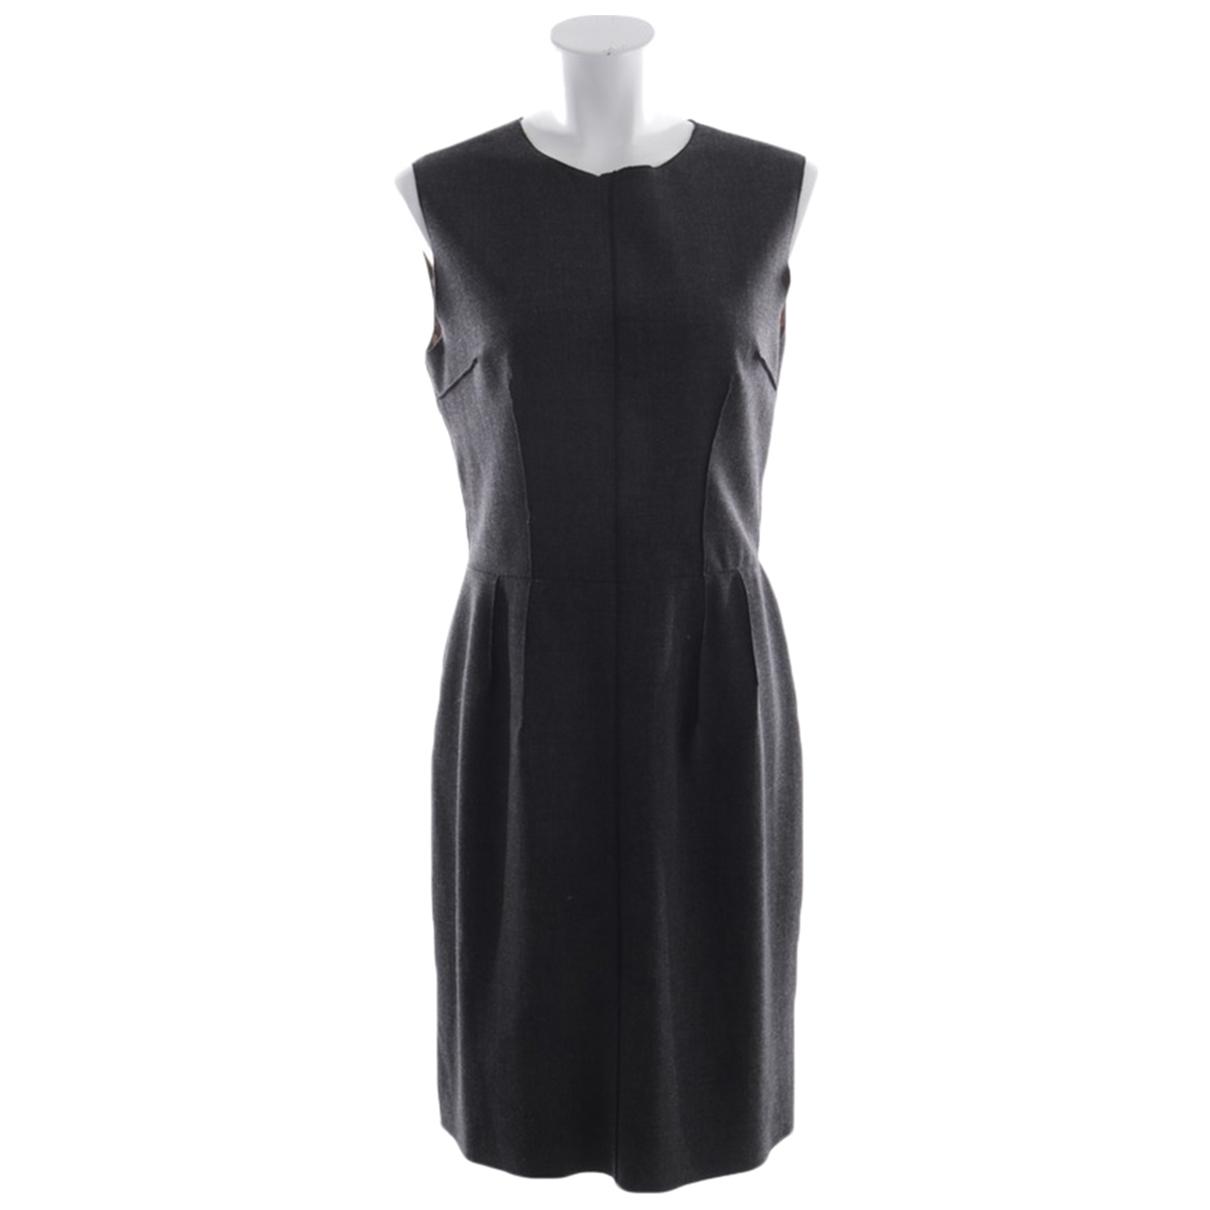 Dolce & Gabbana \N Grey Cotton dress for Women 38 FR